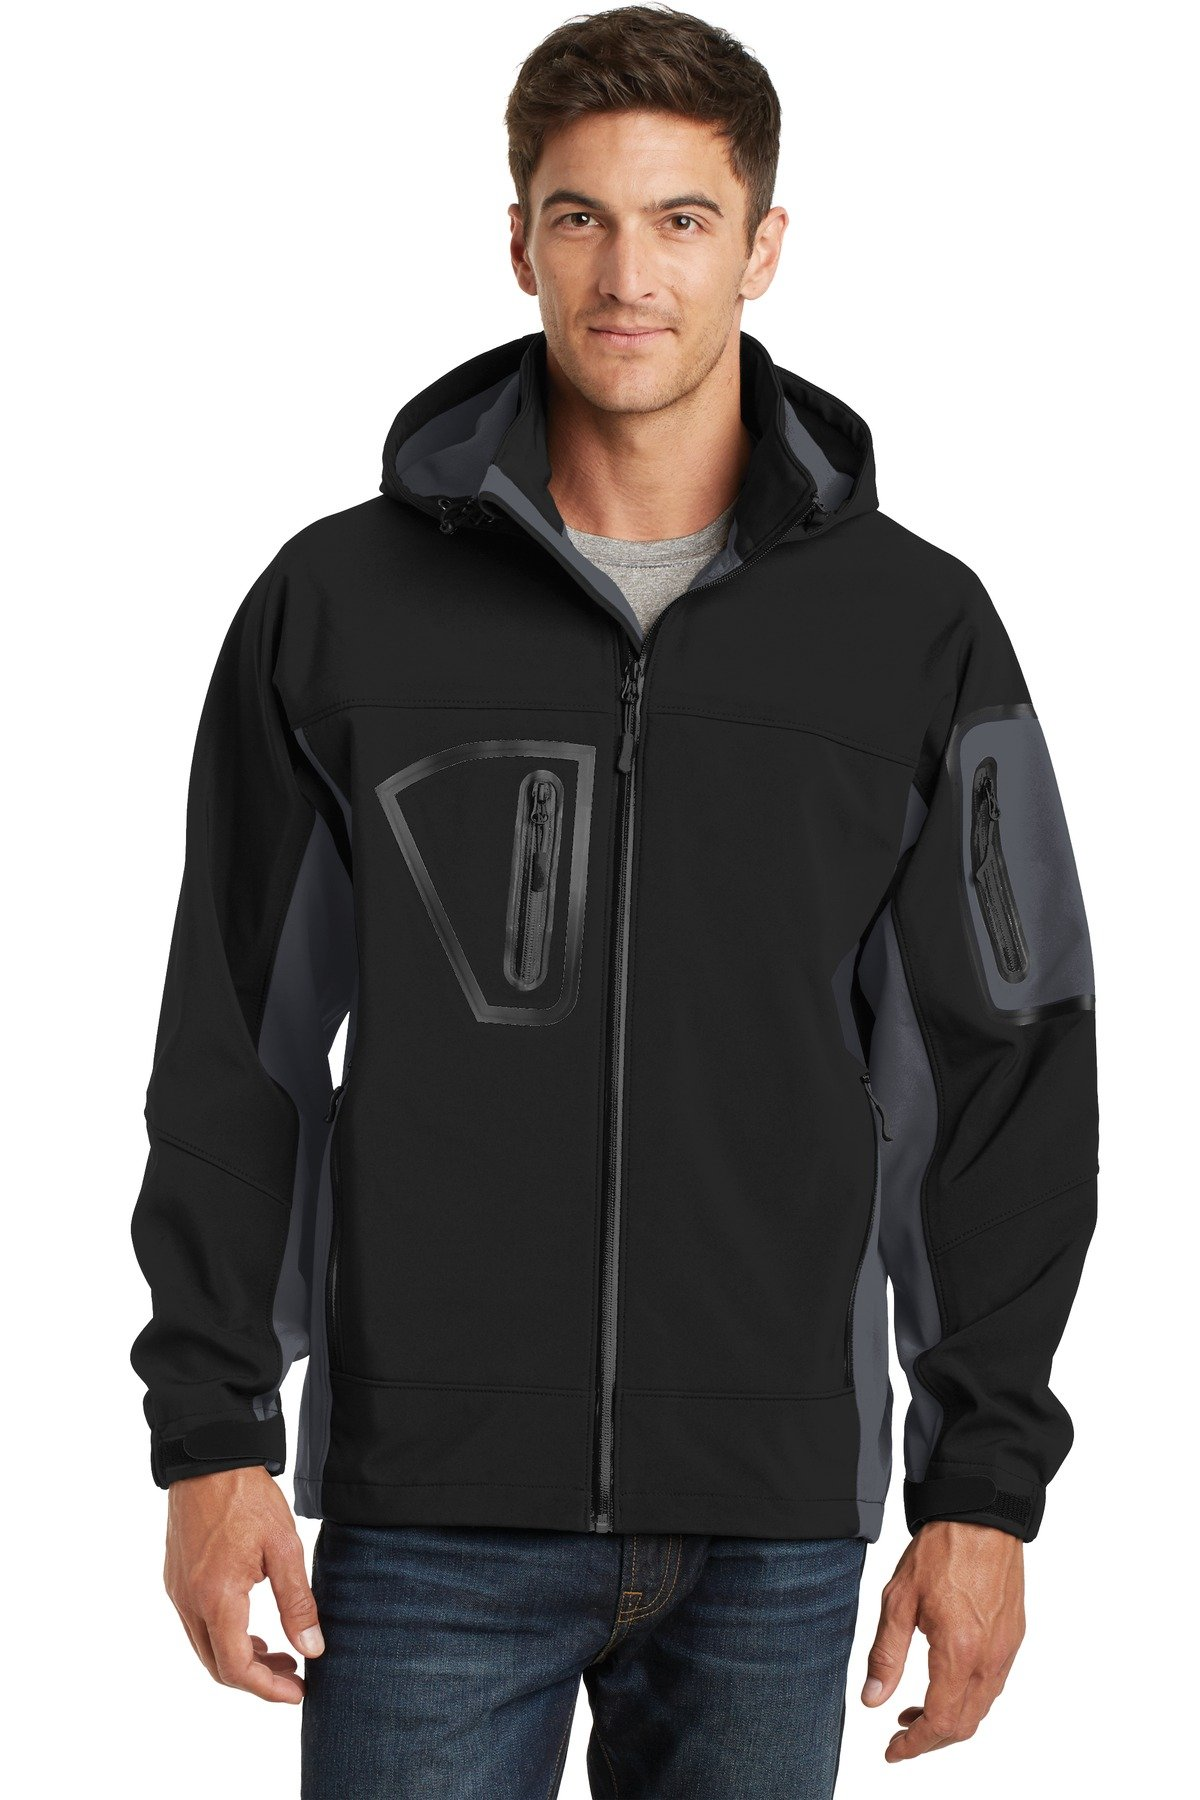 Port Authority Men's Waterproof Soft Shell Jacket XL Black/Graphite